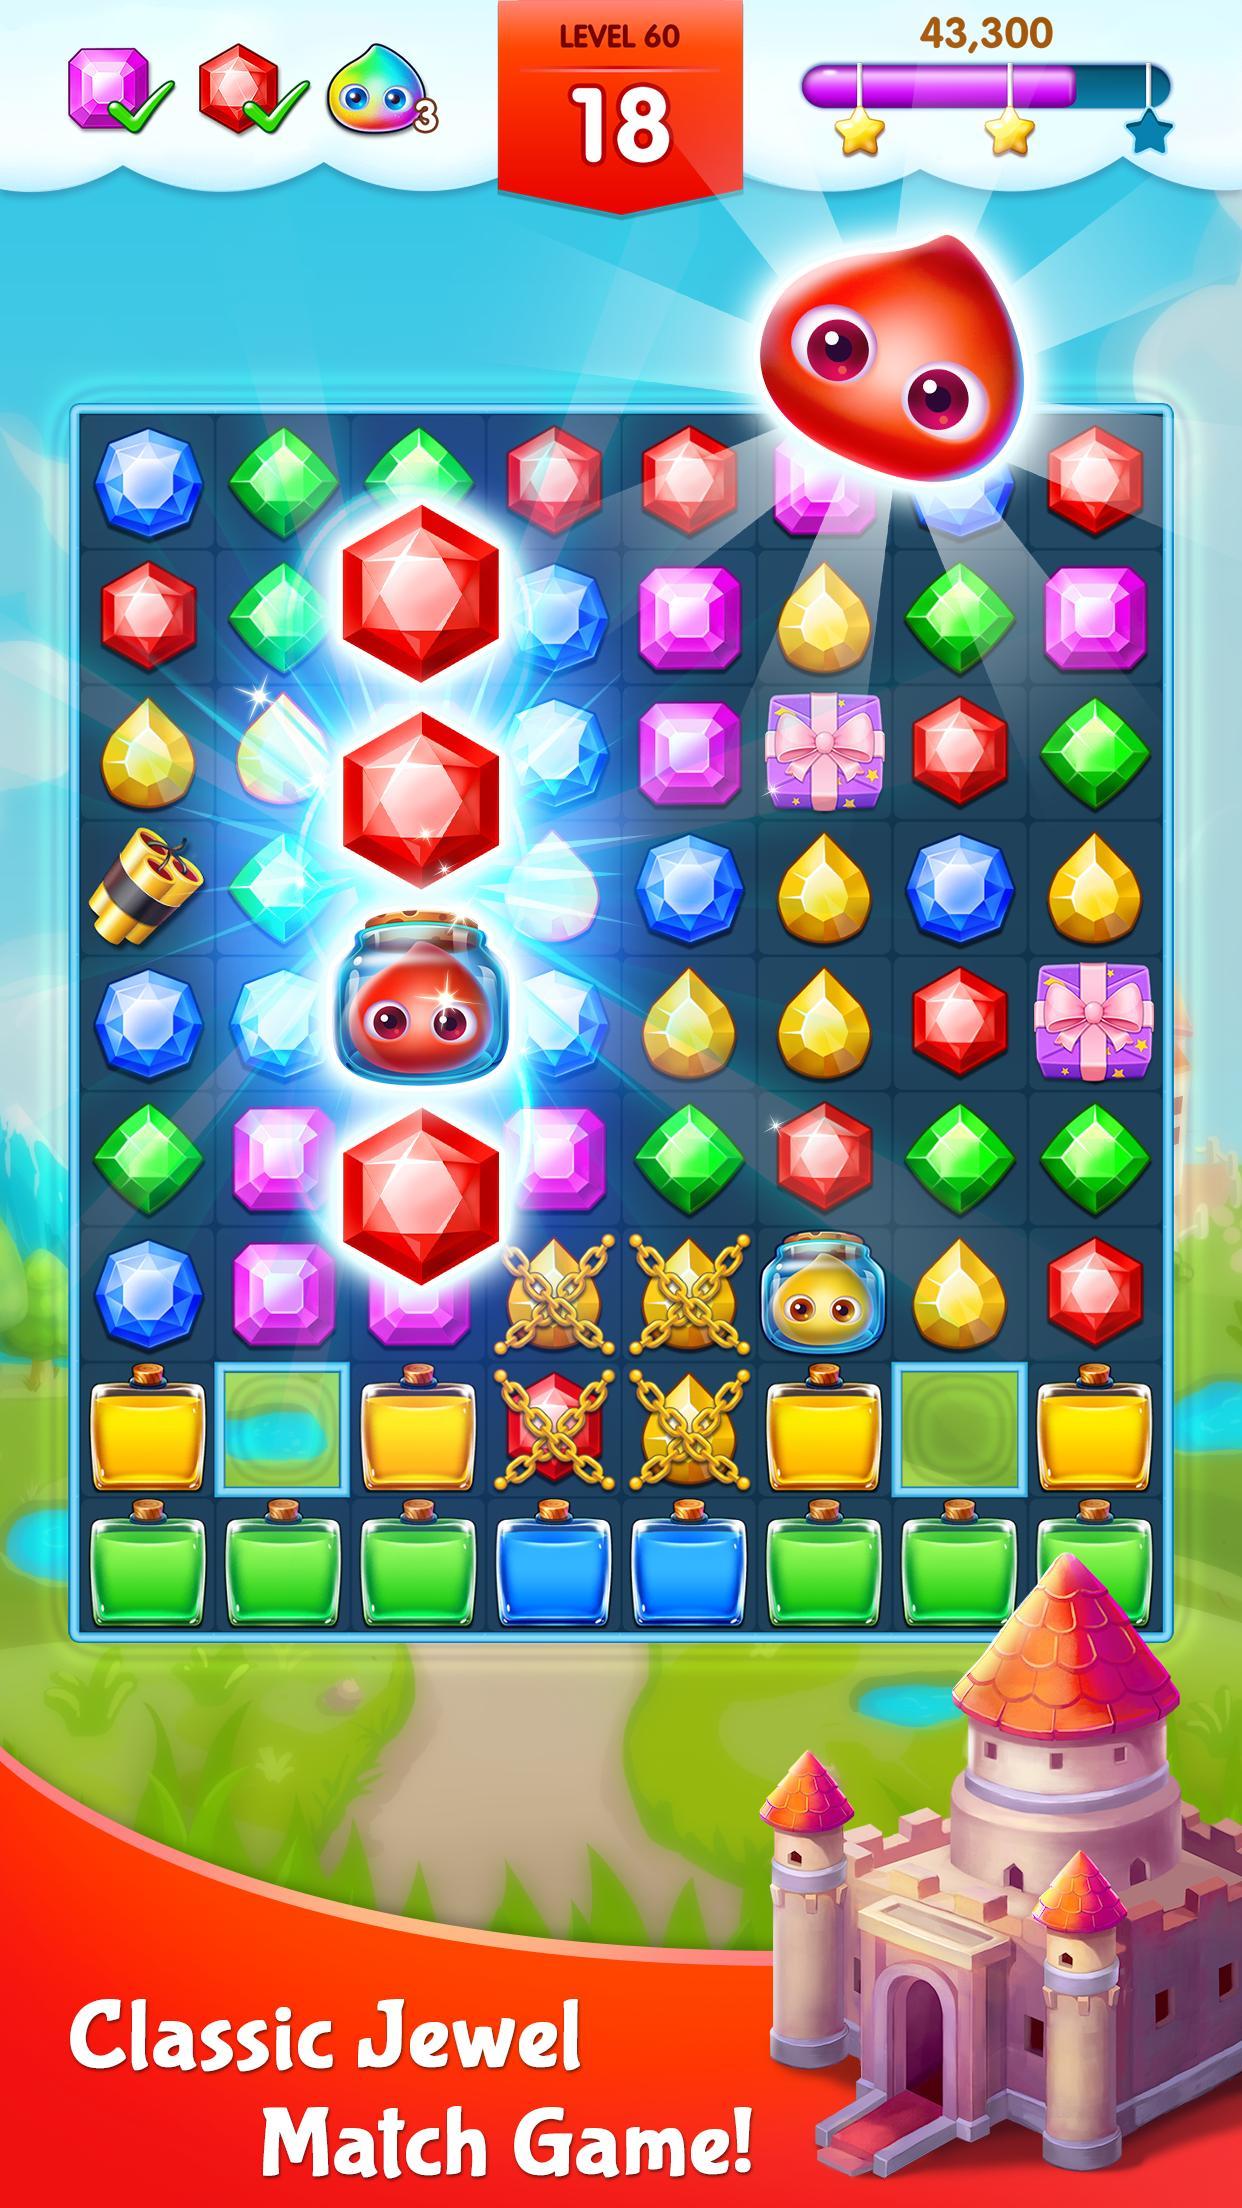 Jewels Legend - Match 3 Puzzle 2.33.3 Screenshot 14